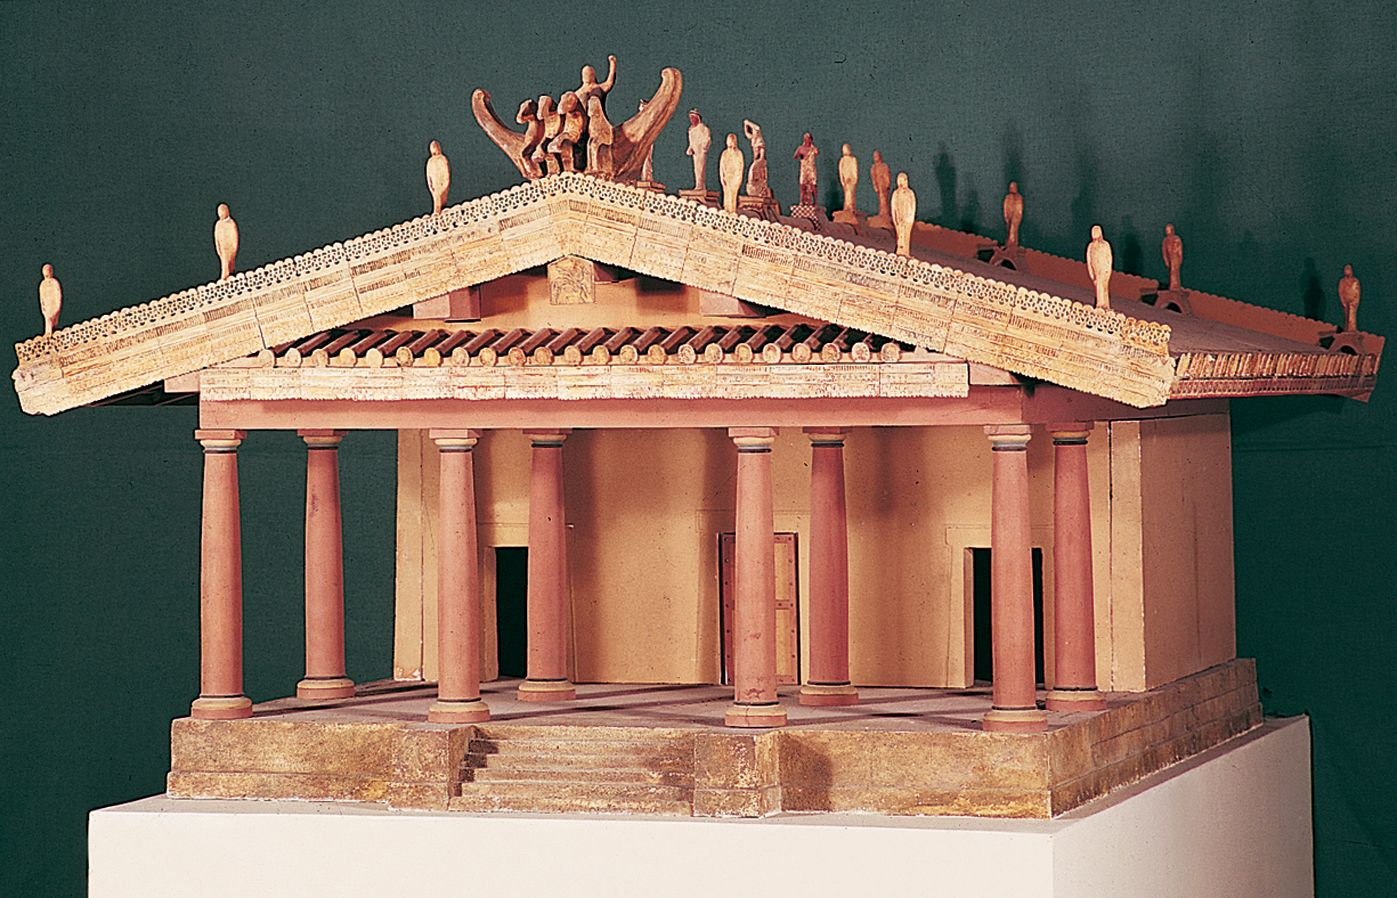 Temple Of Portonaccio Stock Photos and Pictures | Getty Images